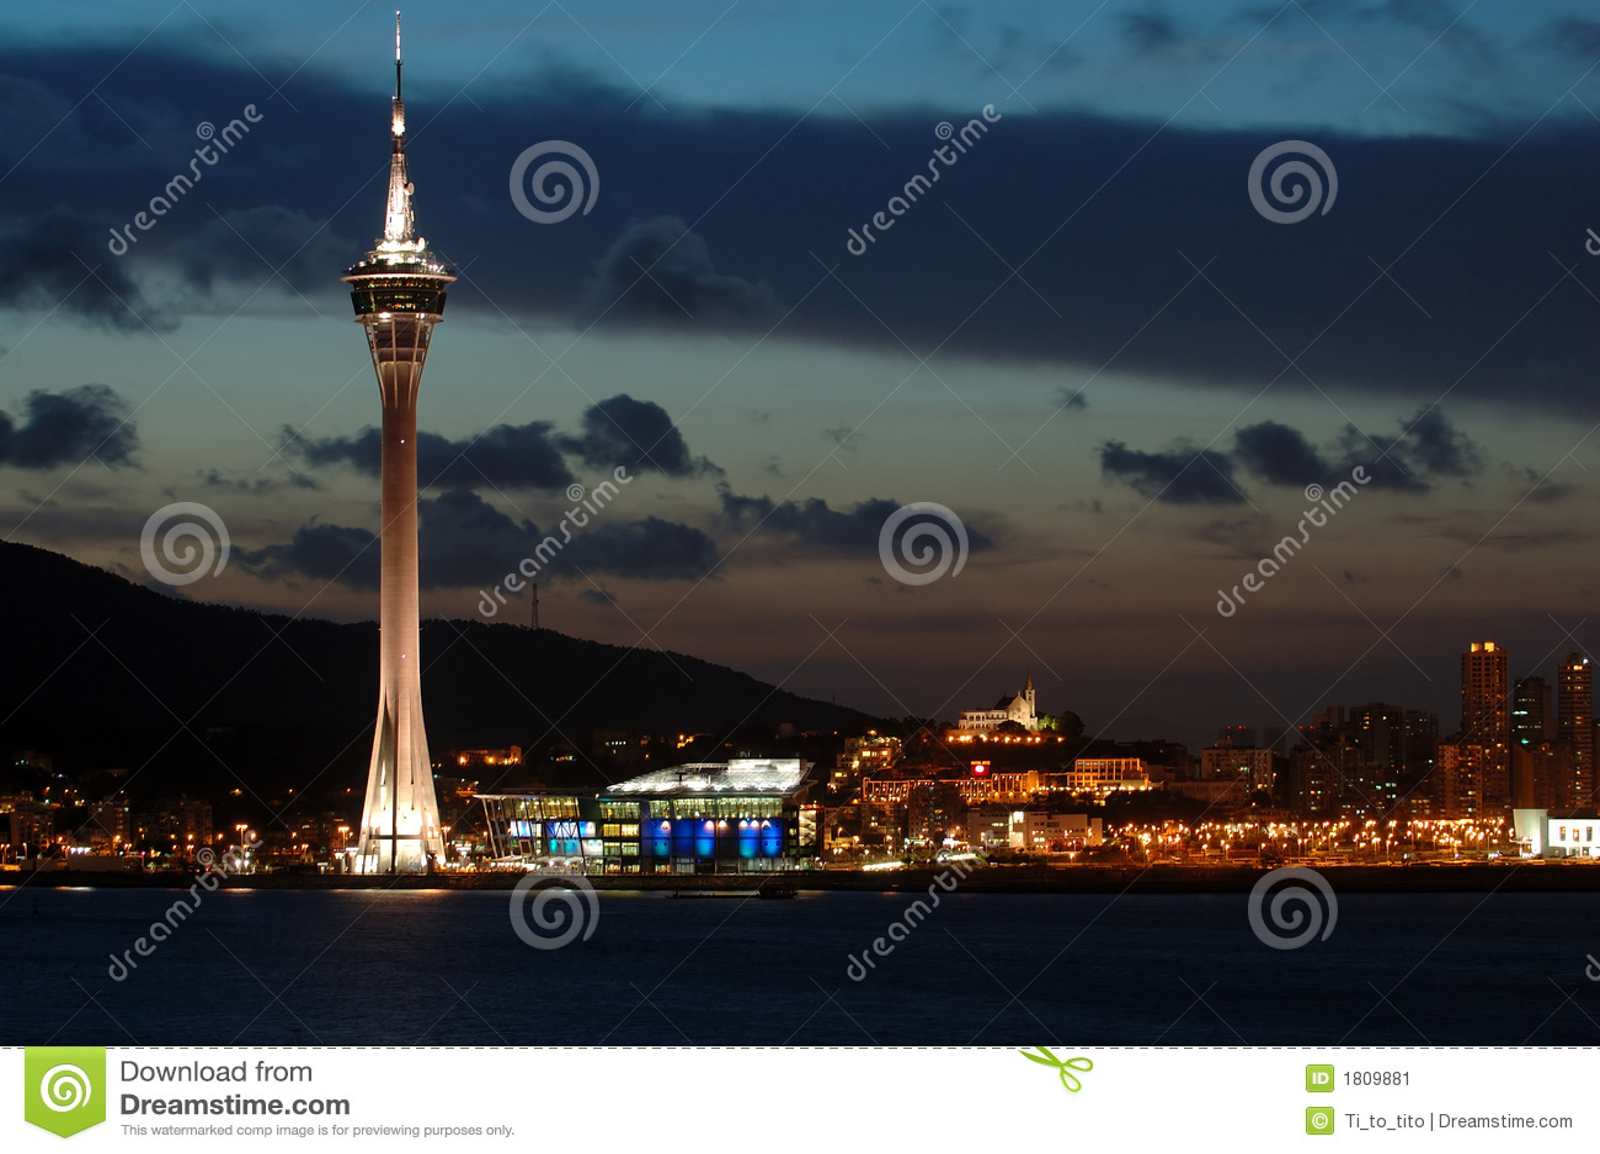 tours travels macau tower - photo #45